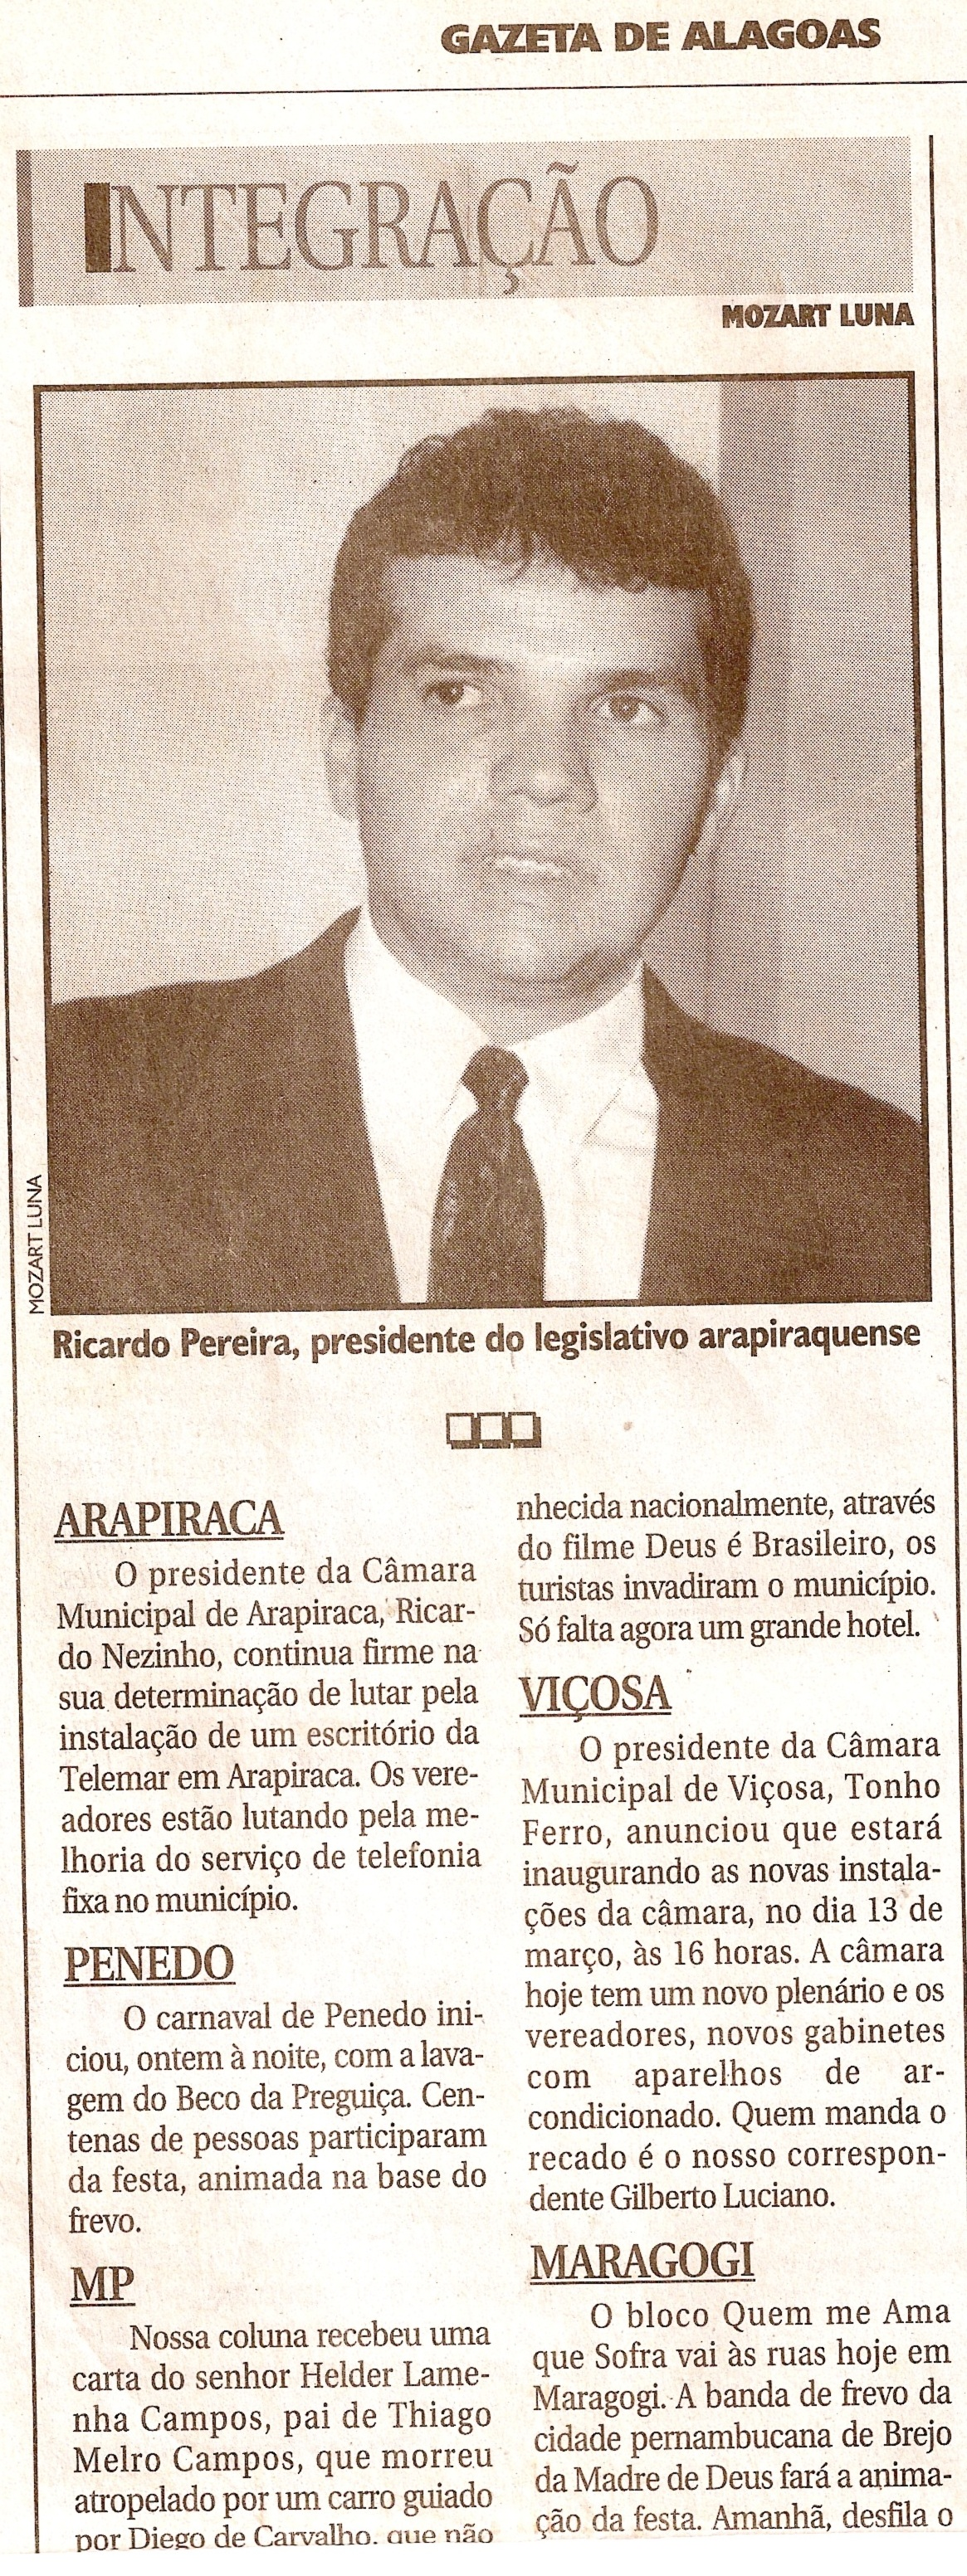 gazeta 01-03-2003